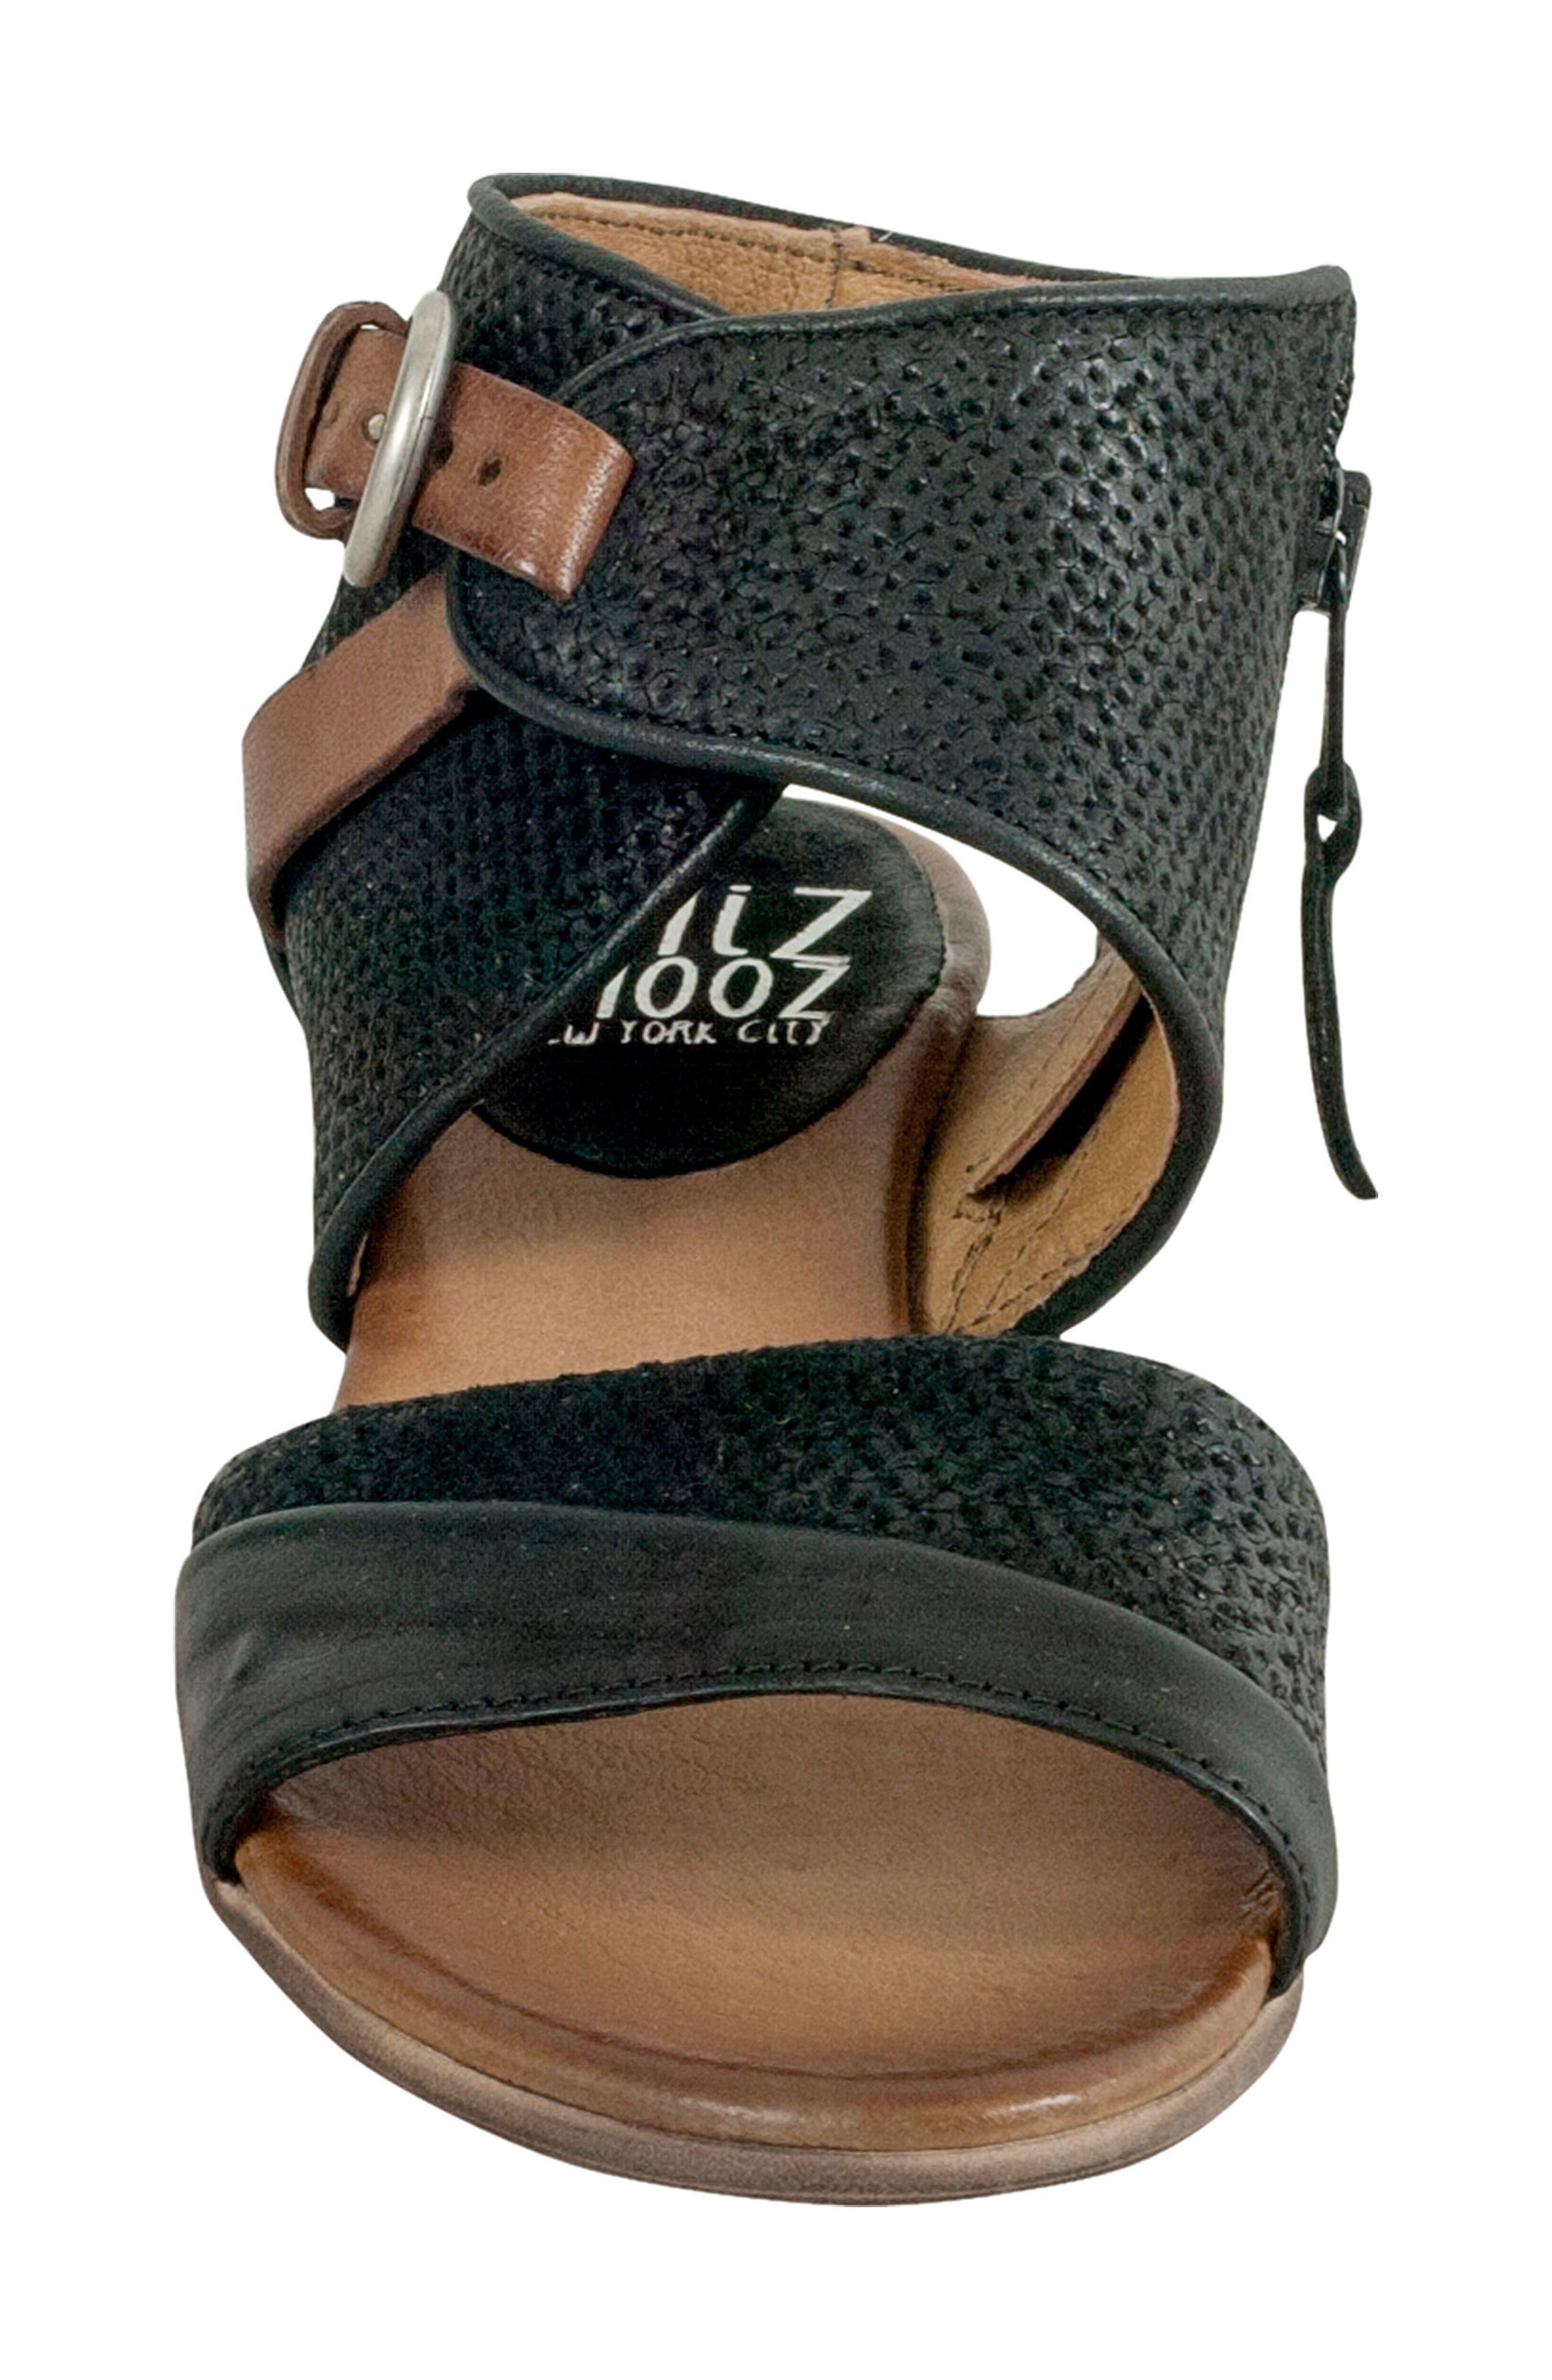 Chatham Textured Sandal,                             Alternate thumbnail 4, color,                             001